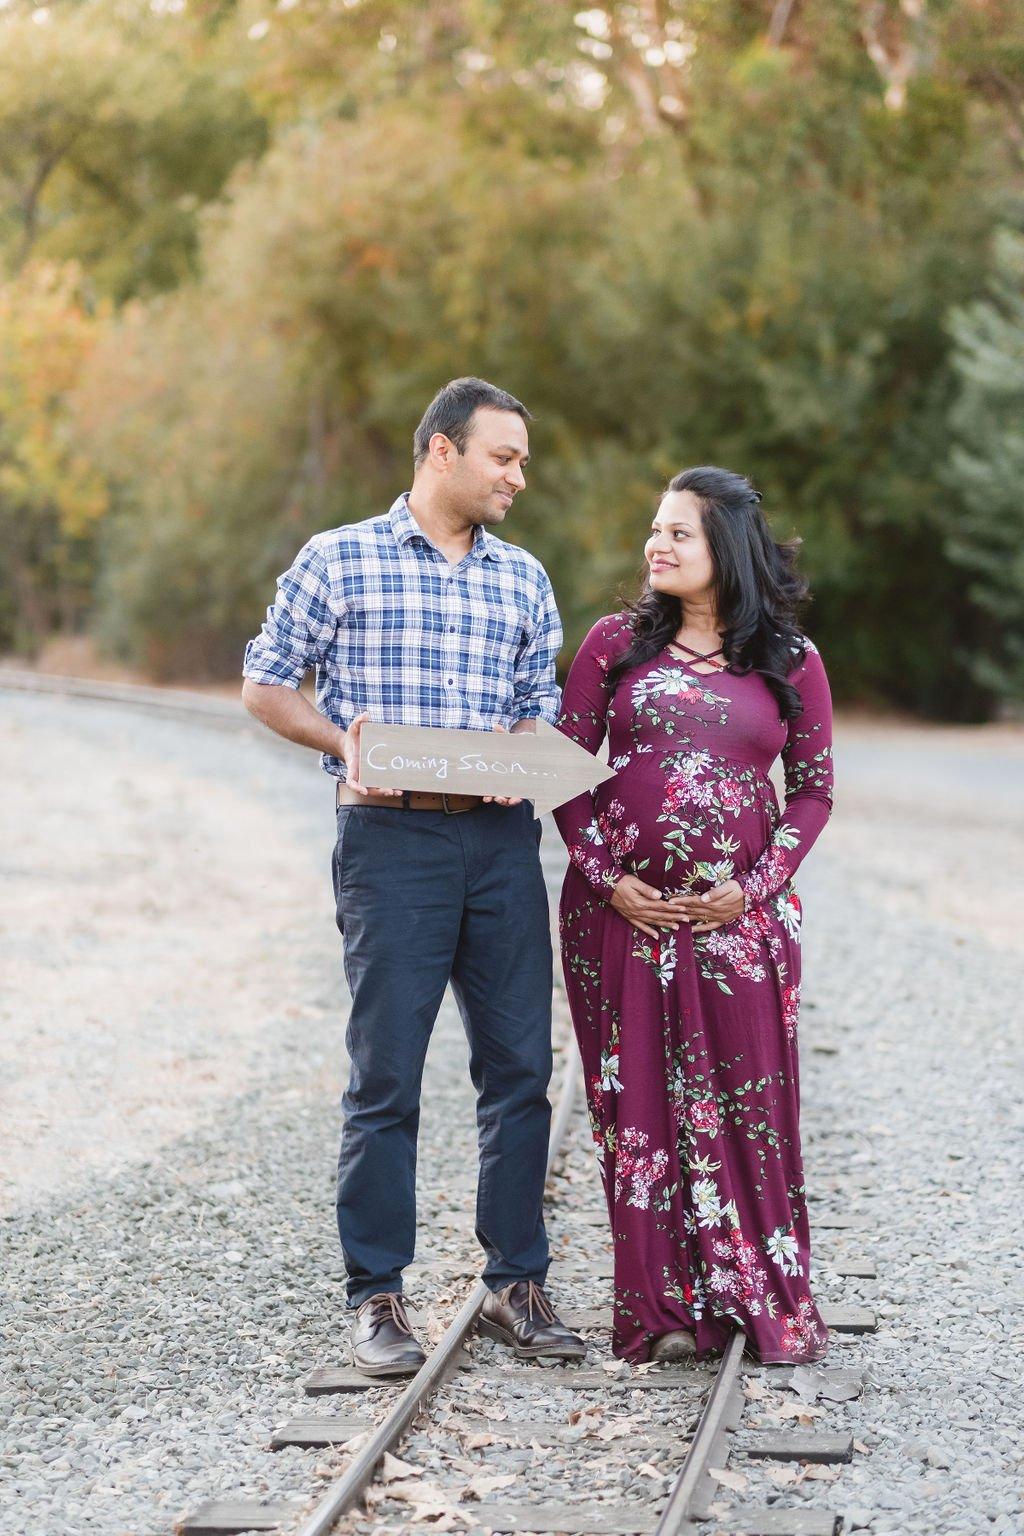 Maternity Photoshoot Prop